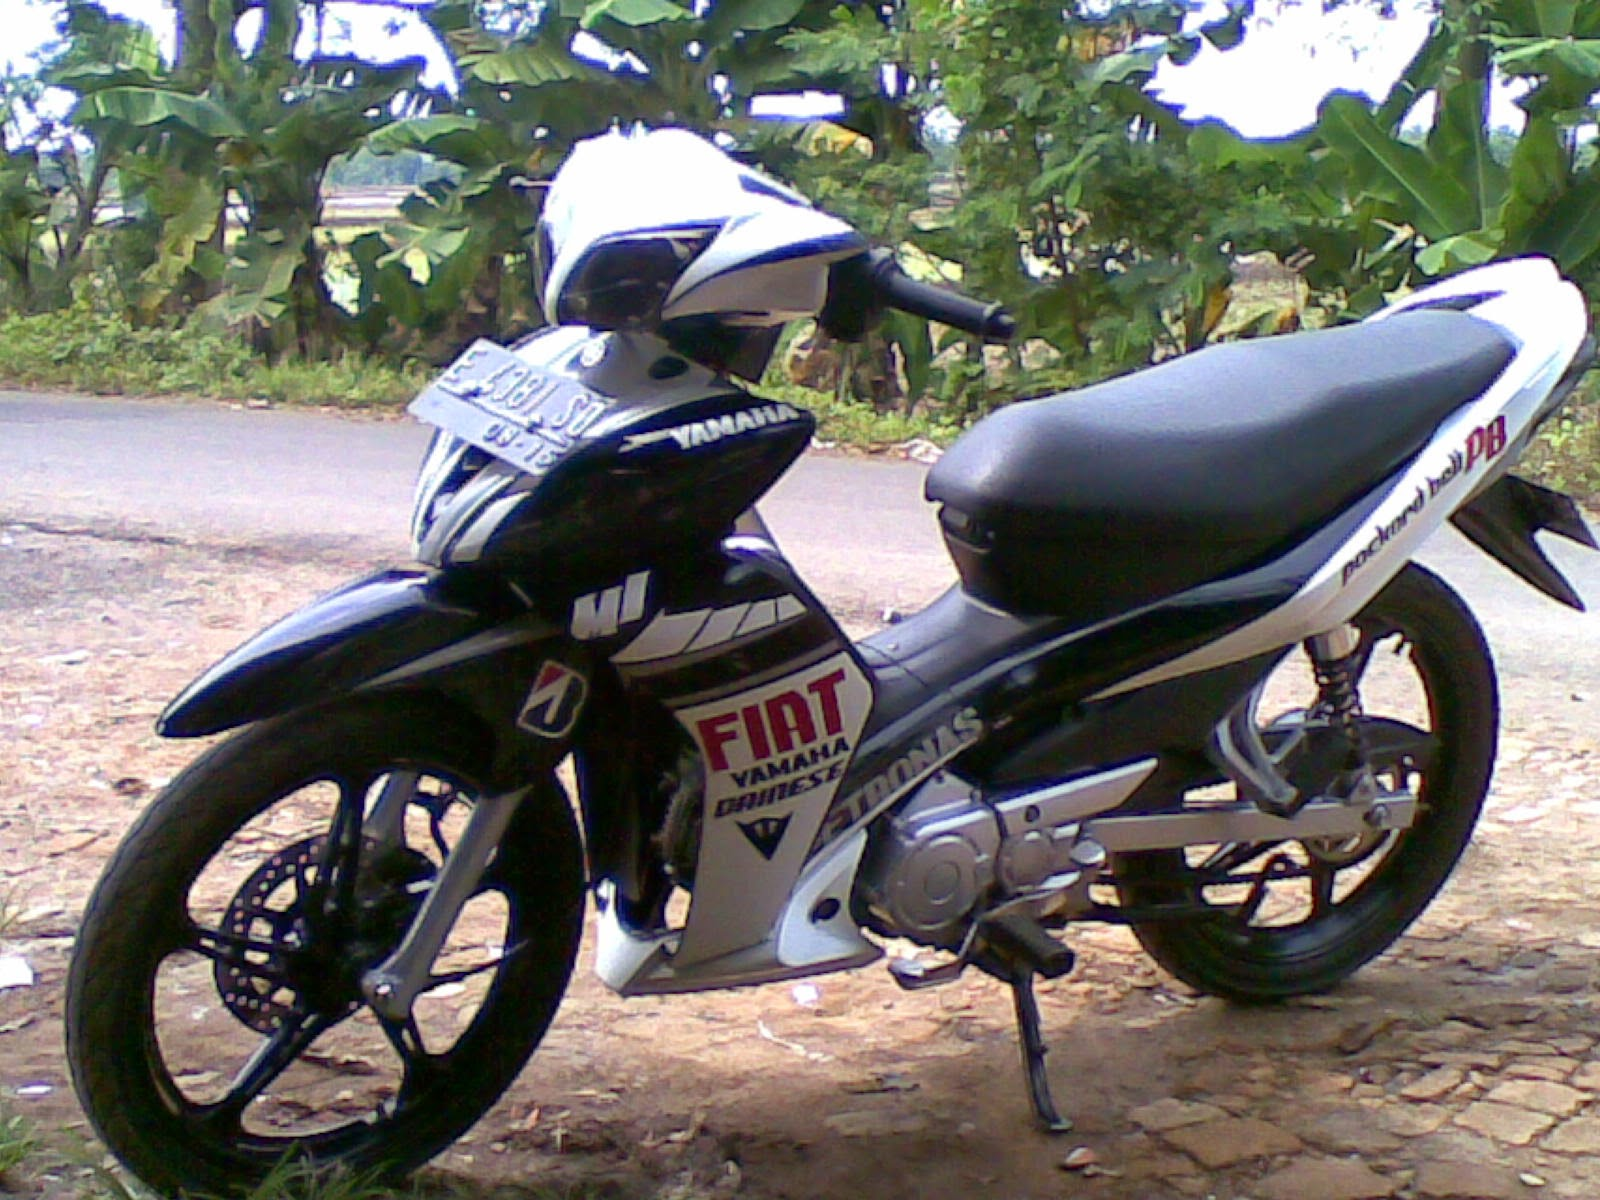 Modifikasi Jupiter z 2004 Modifikasi Yamaha Jupiter z